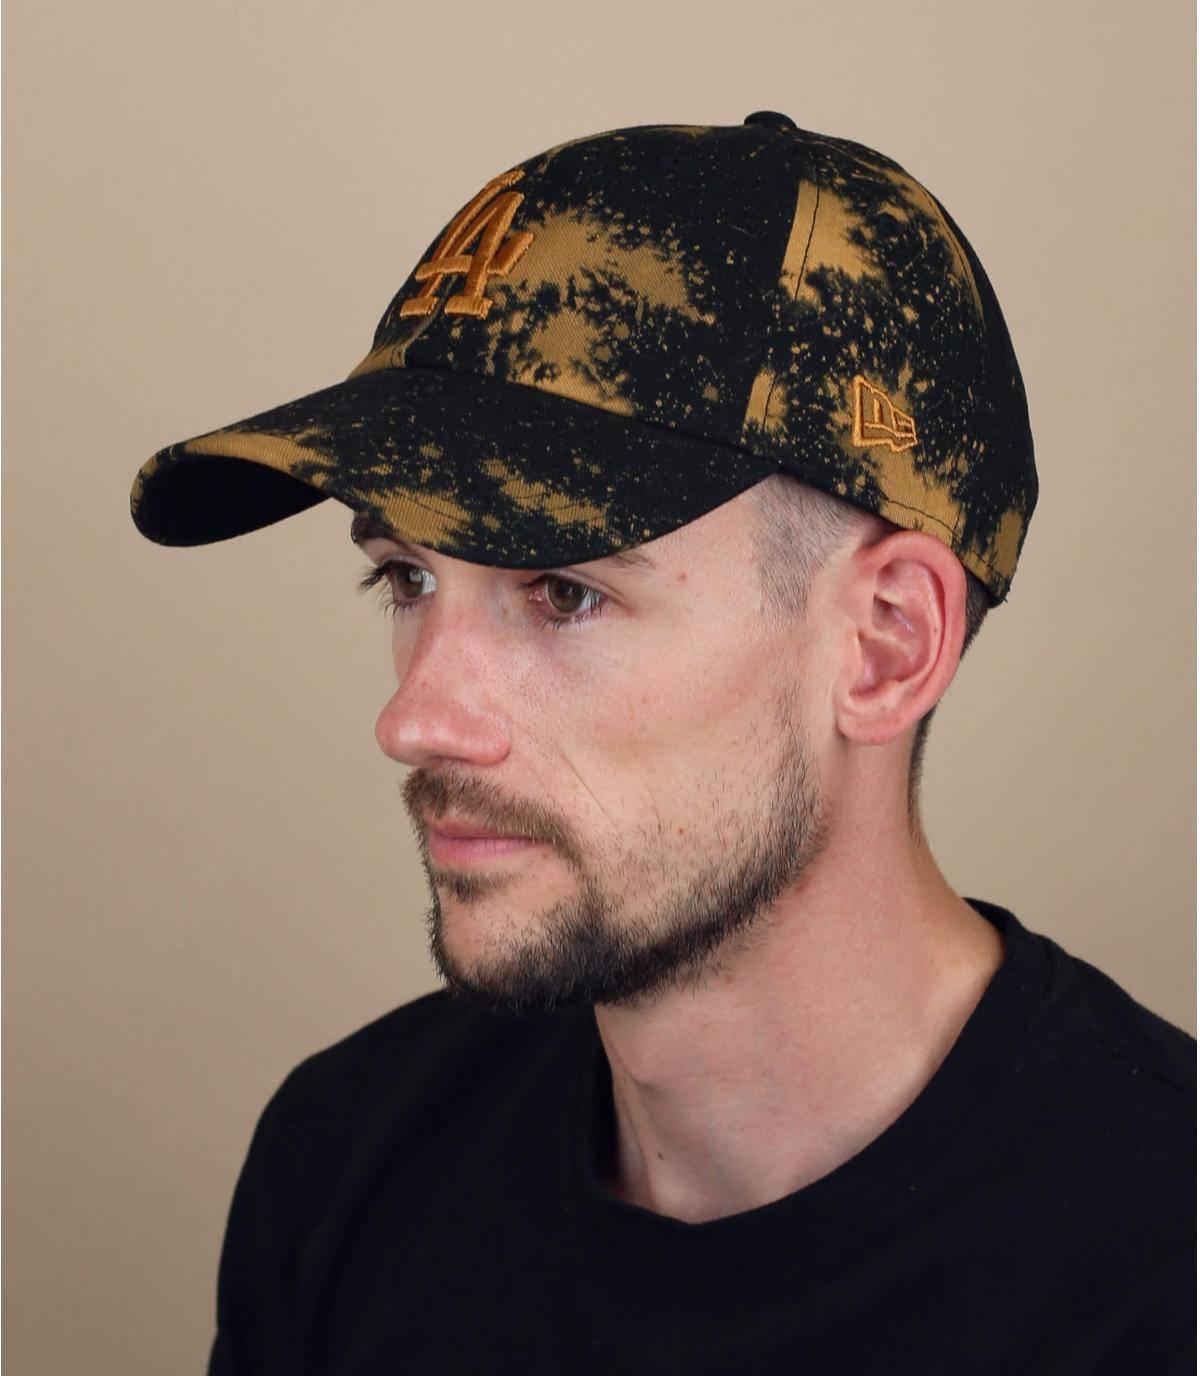 zwarte LA cap